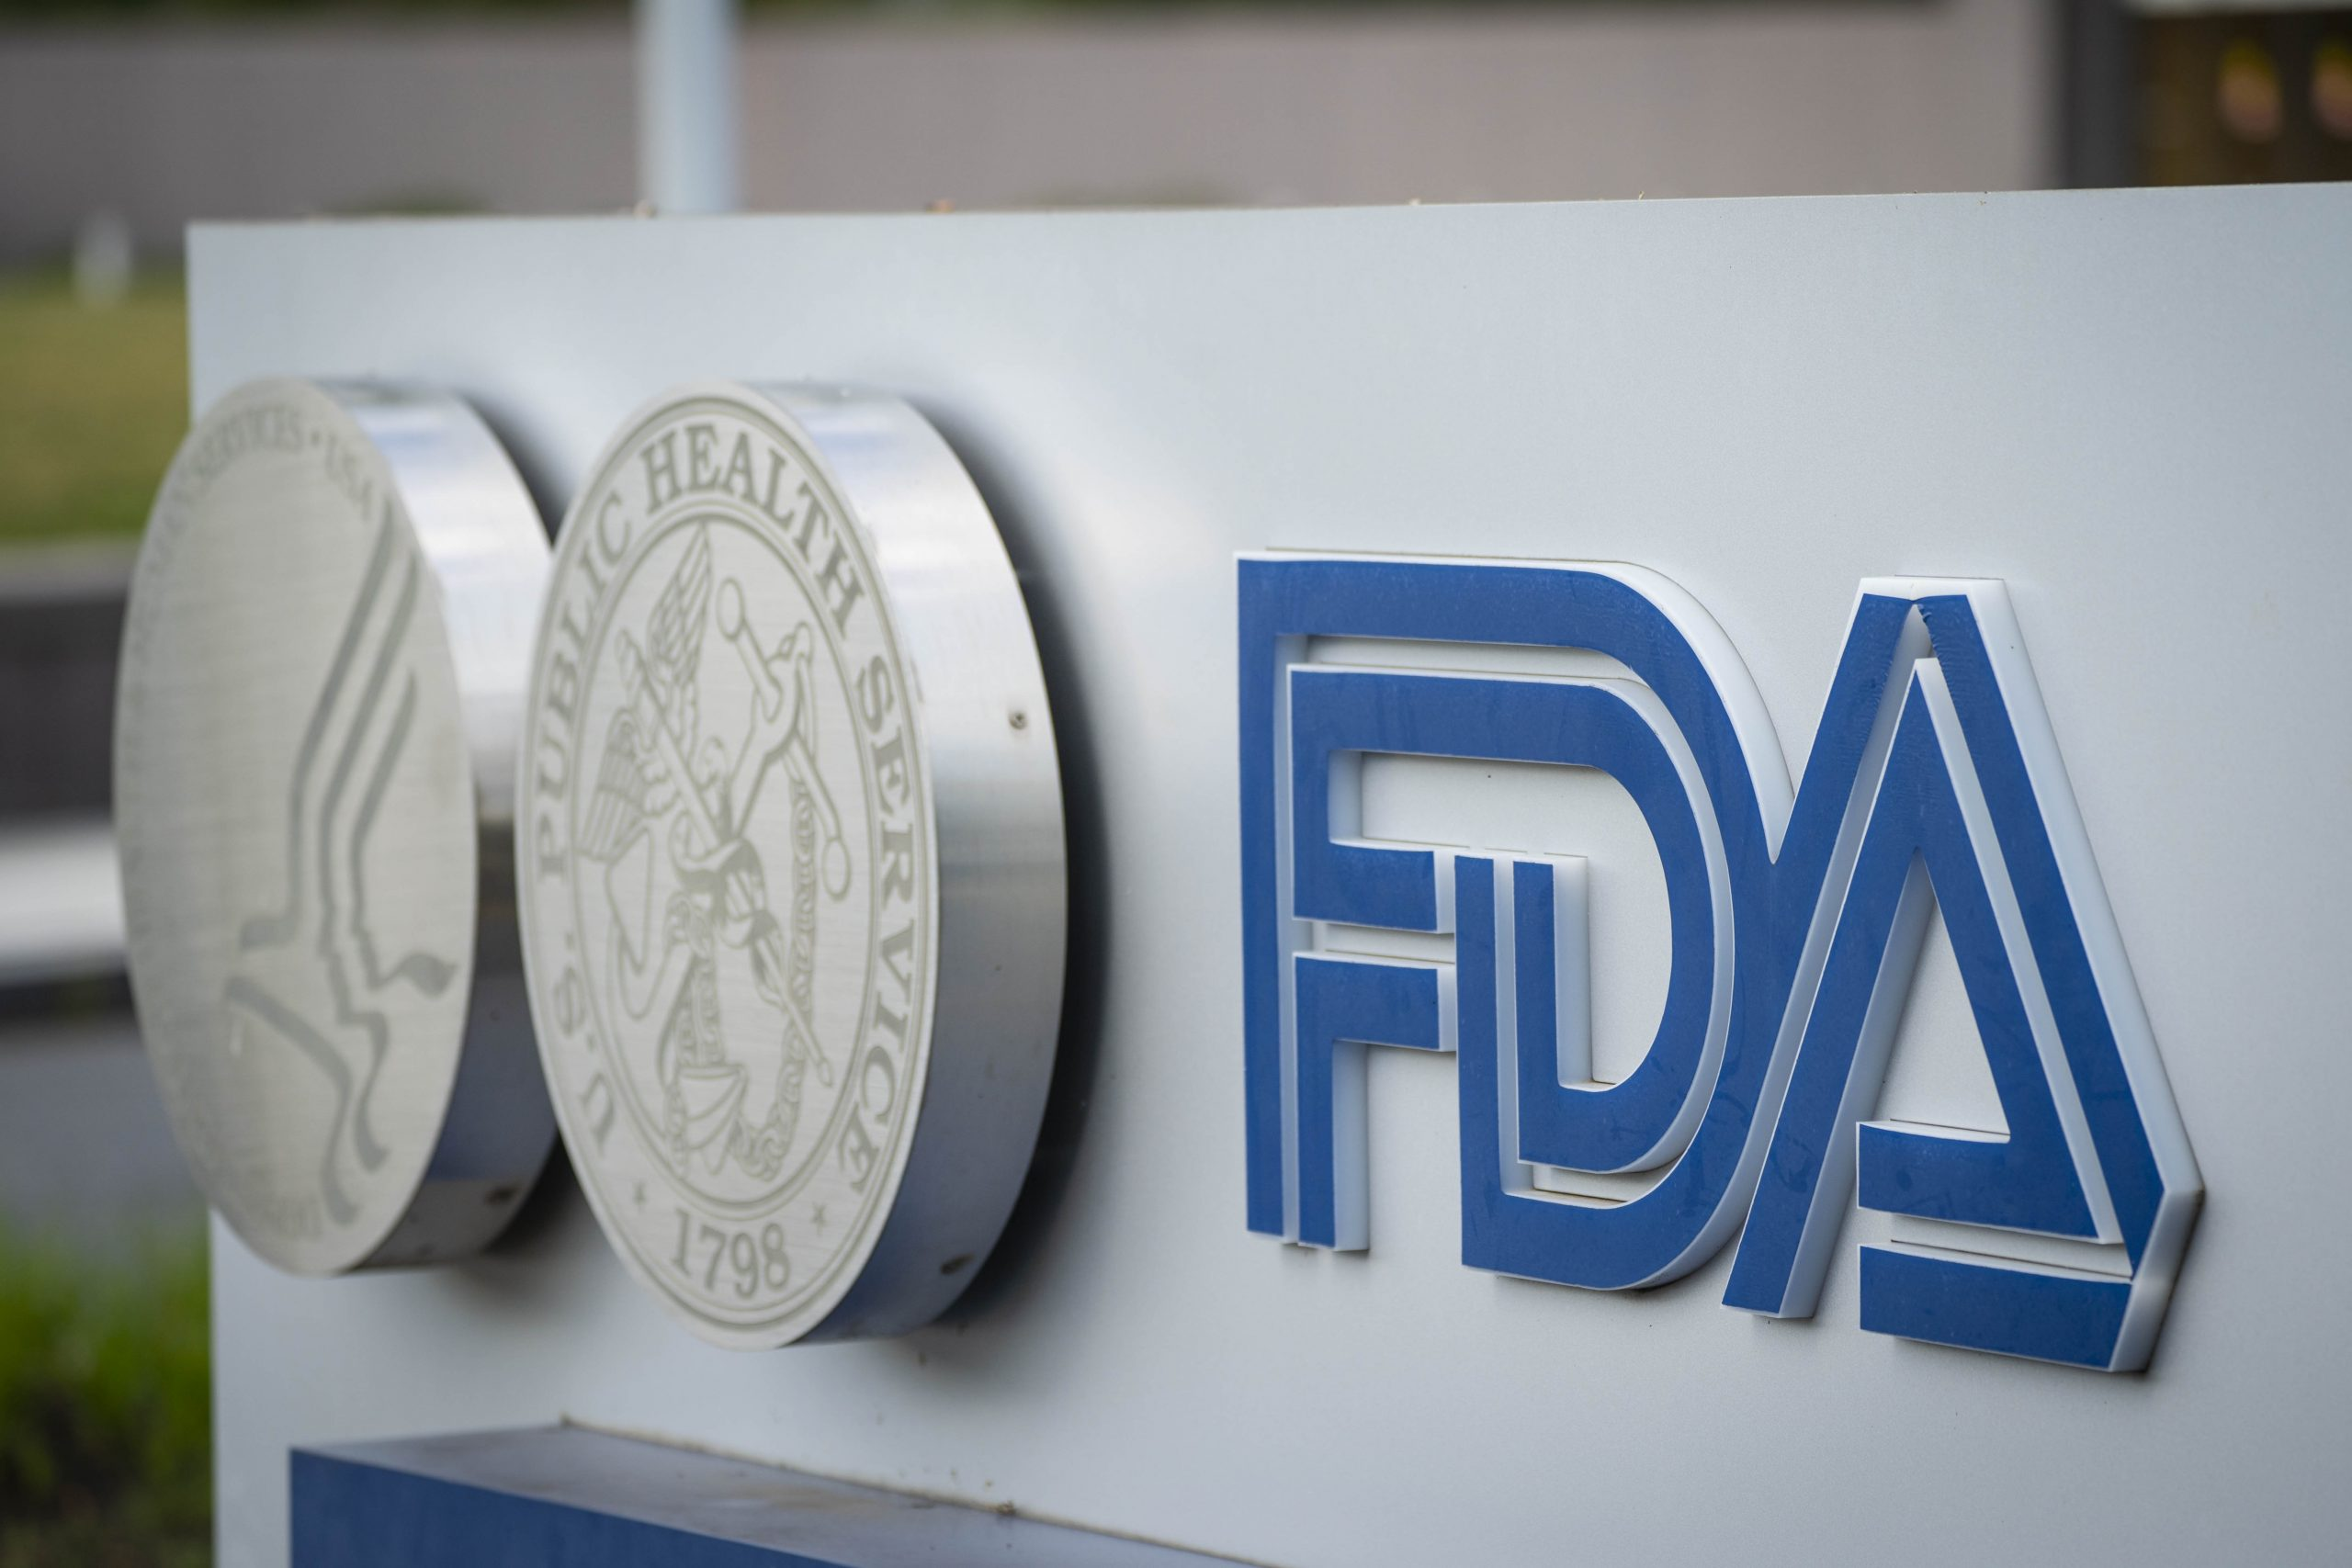 FDA approves Pfizer's vaccine against COVID-19 in the U.S.